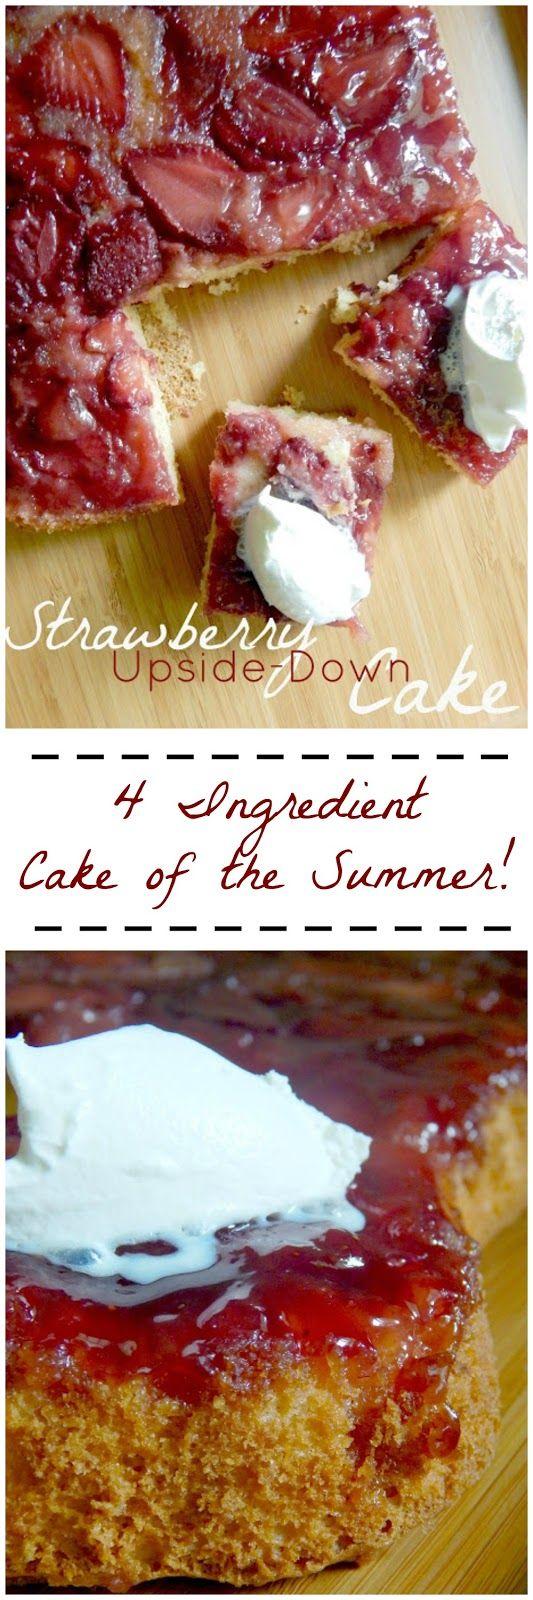 strawberry upside down cake (sweetandsavoryfood.com)